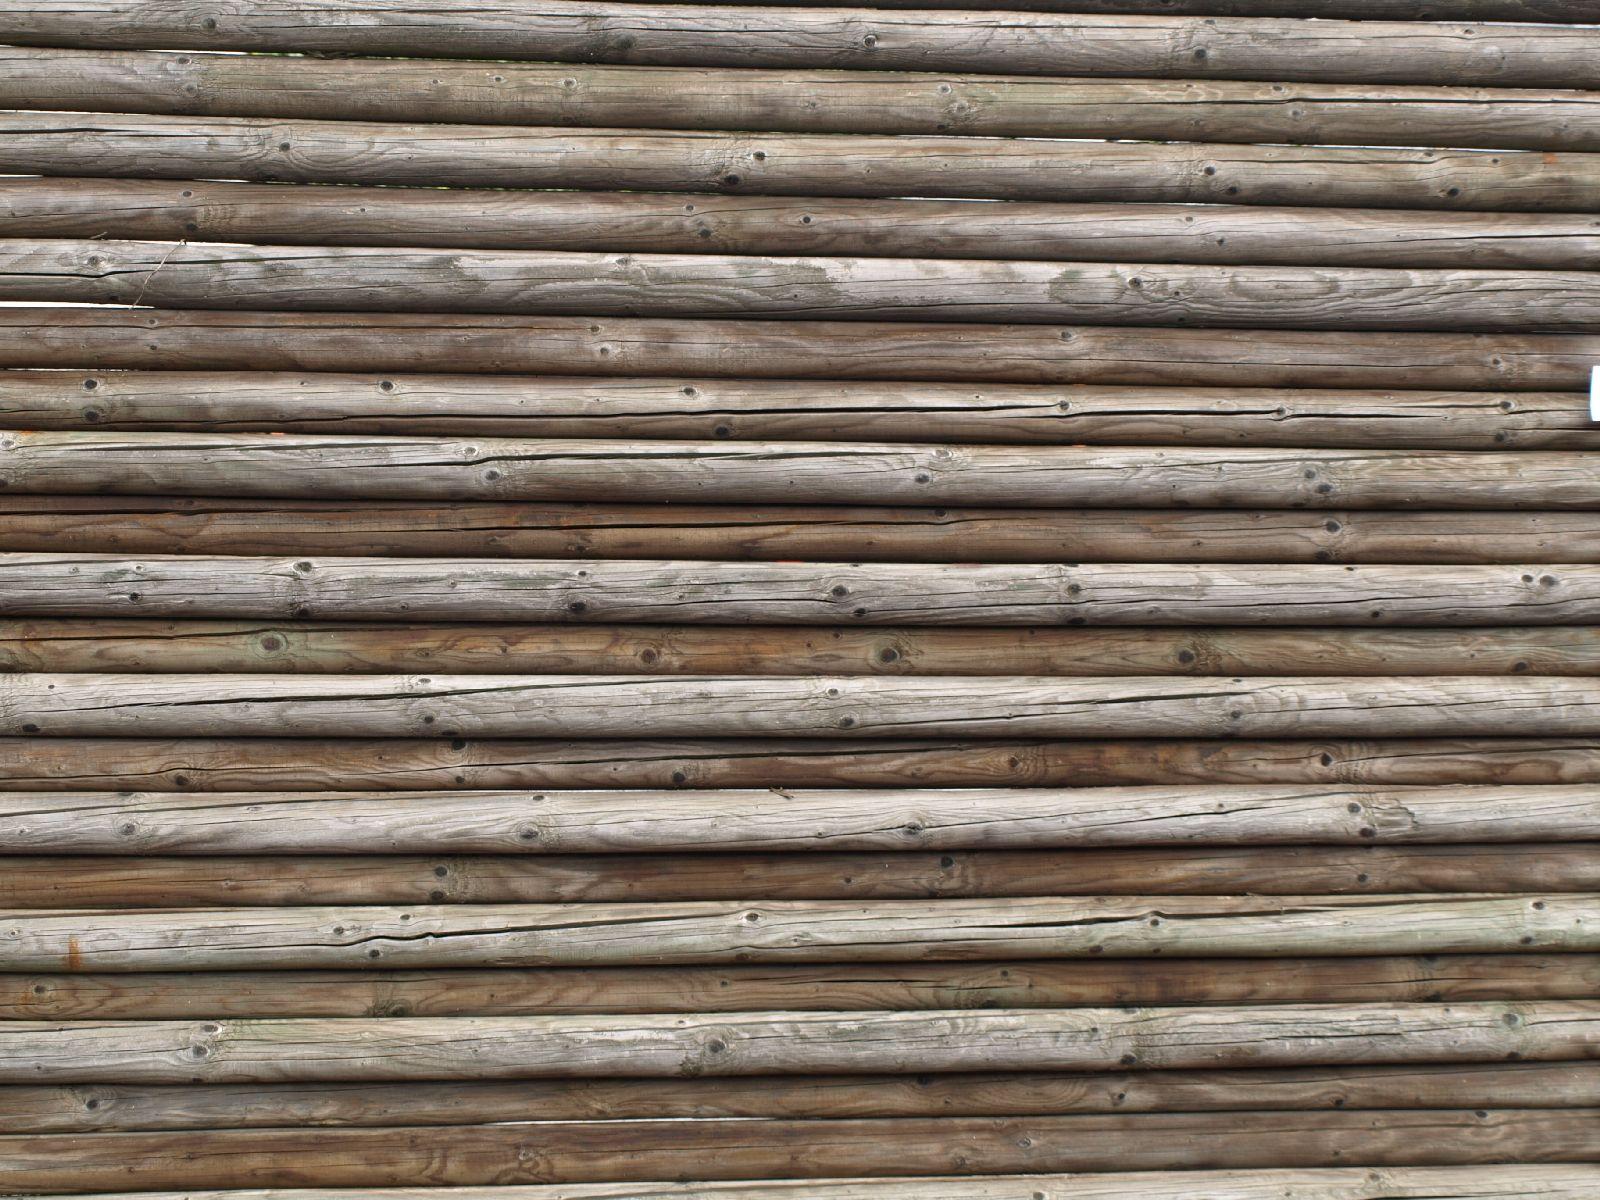 Wood_Texture_A_P4110704